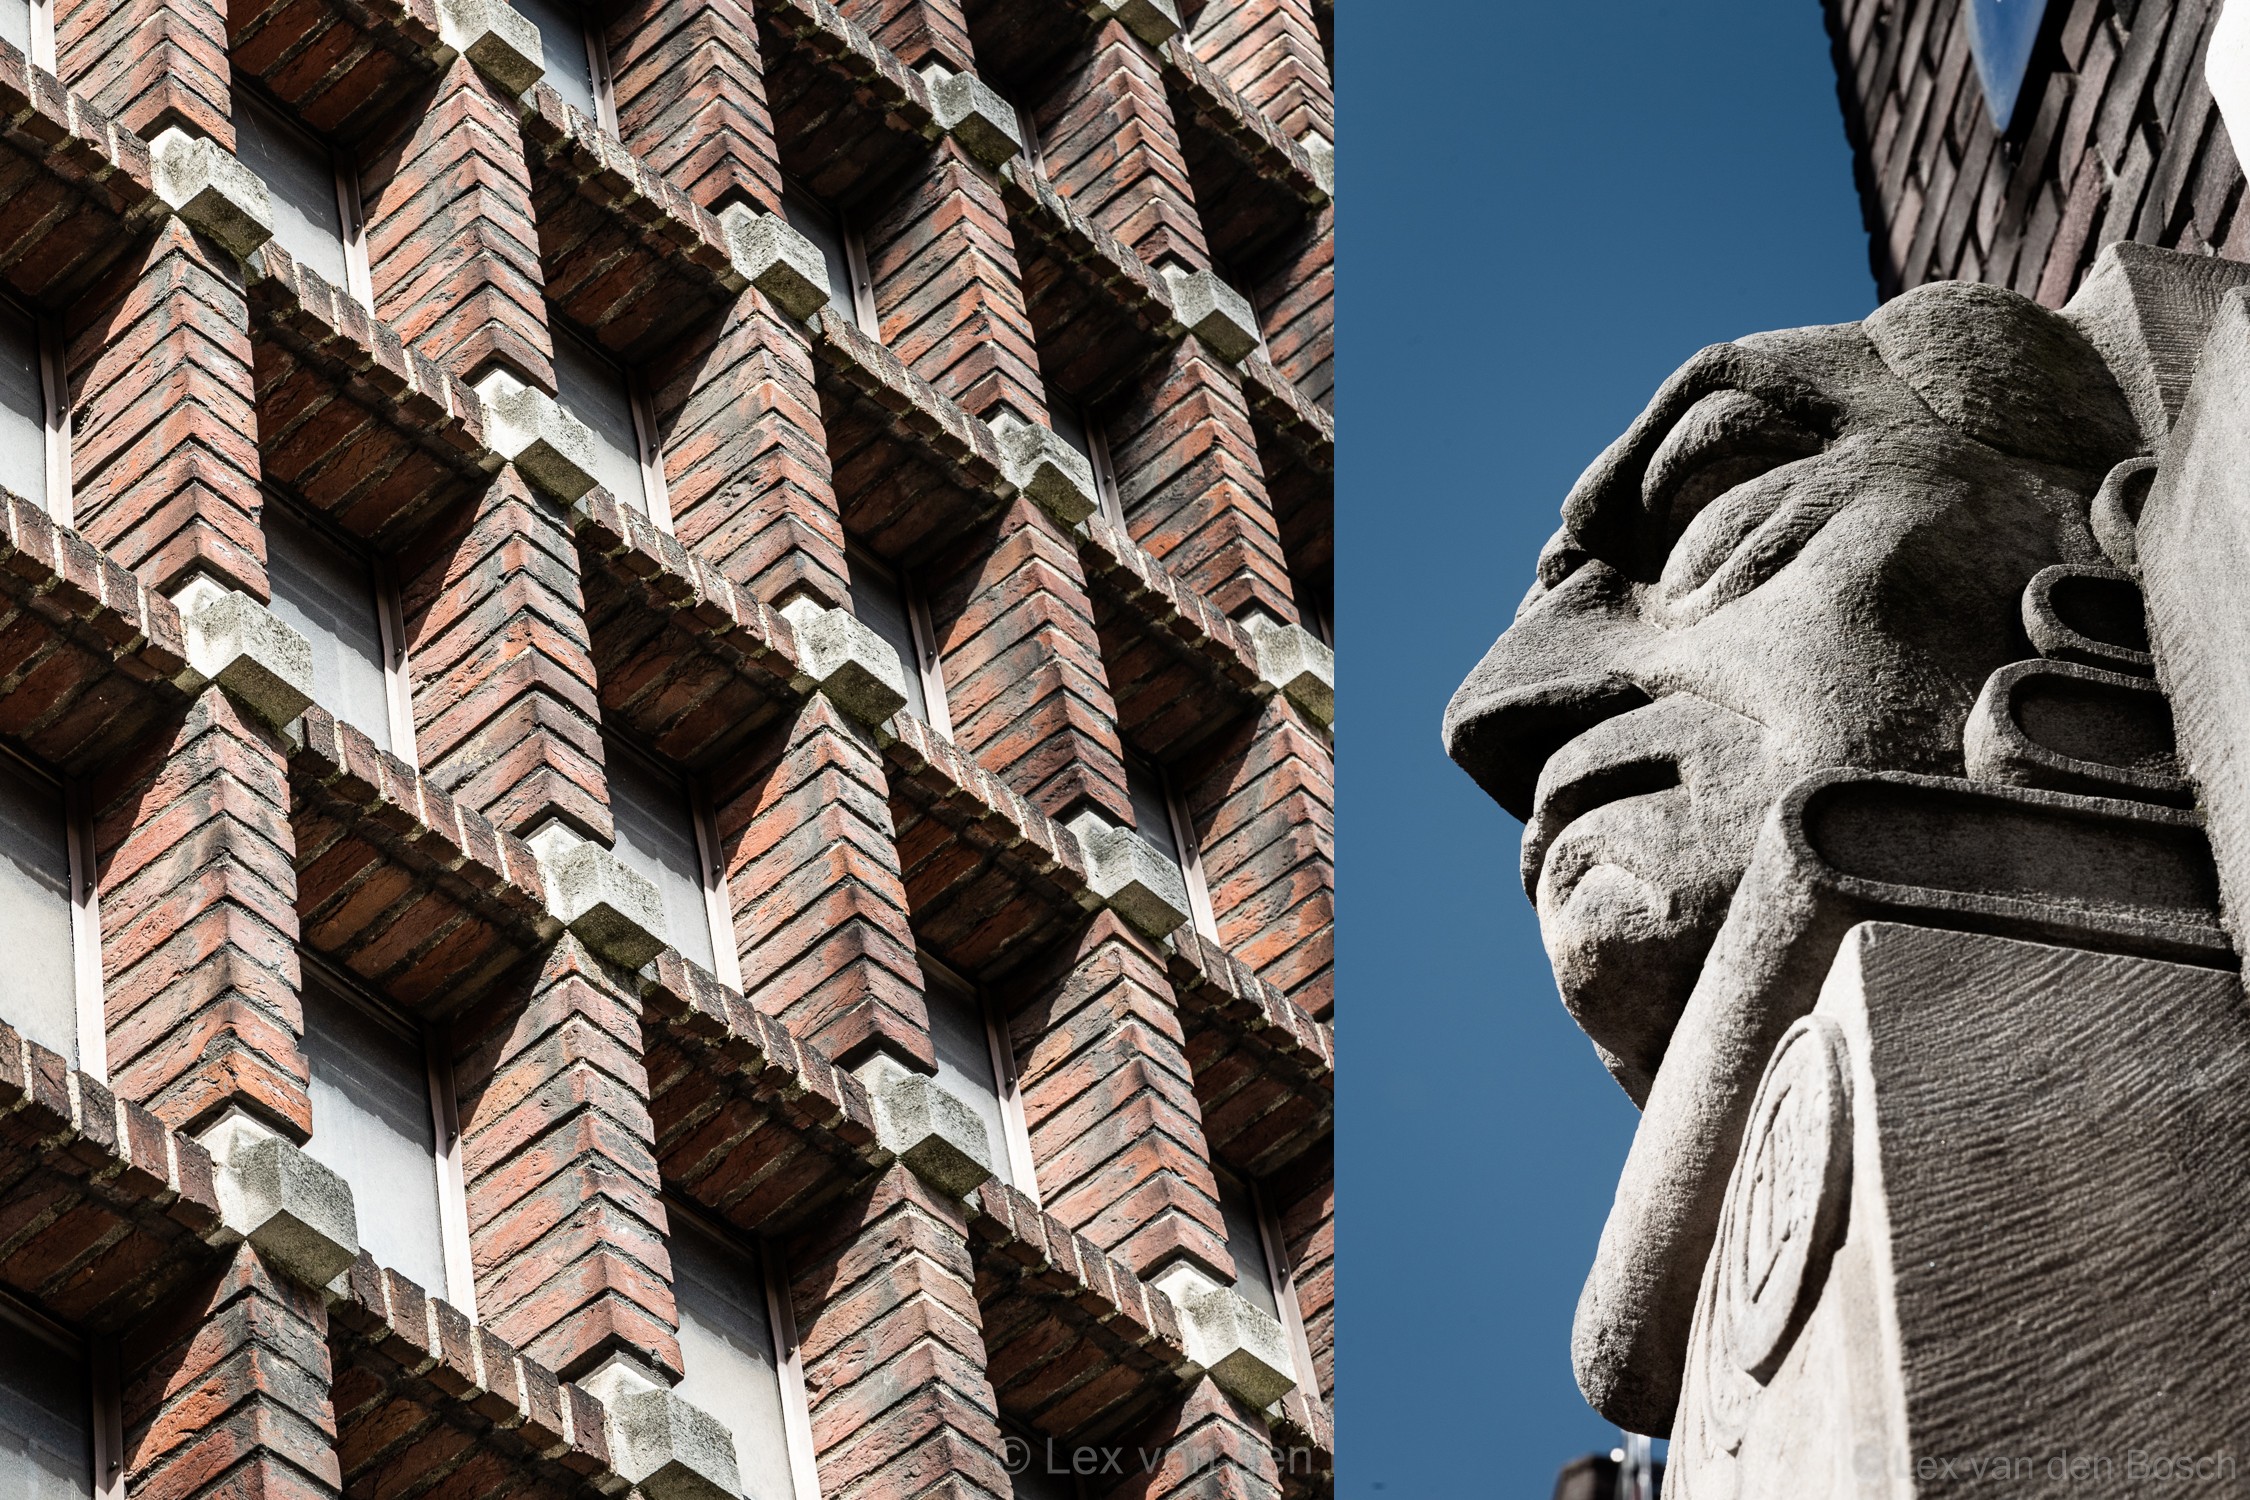 Fotowandeling & workshop Architectuur in Amsterdam-Zuid; Plan Zuid & Amsterdamse School